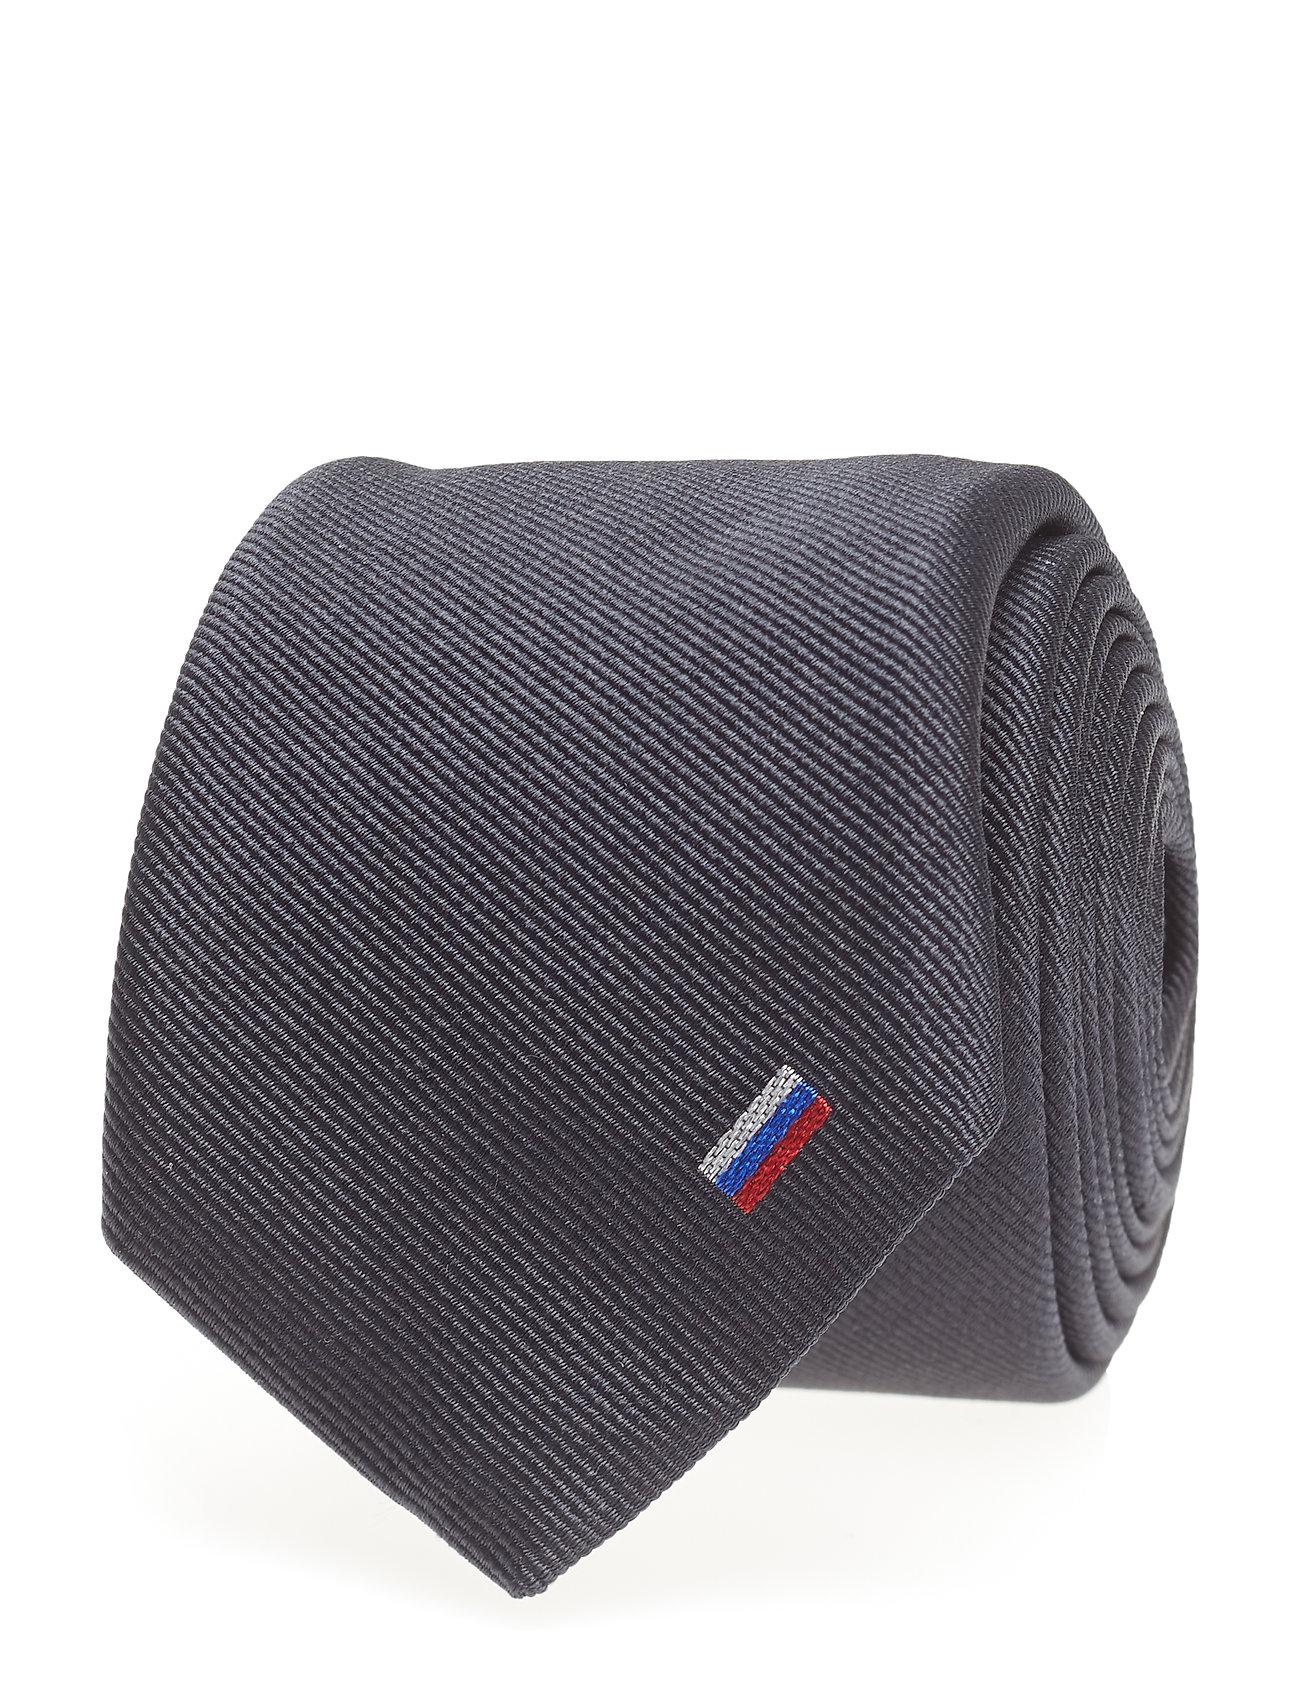 Image of Tie 6 Cm Slips Blå BOSS Business Wear (3333155133)